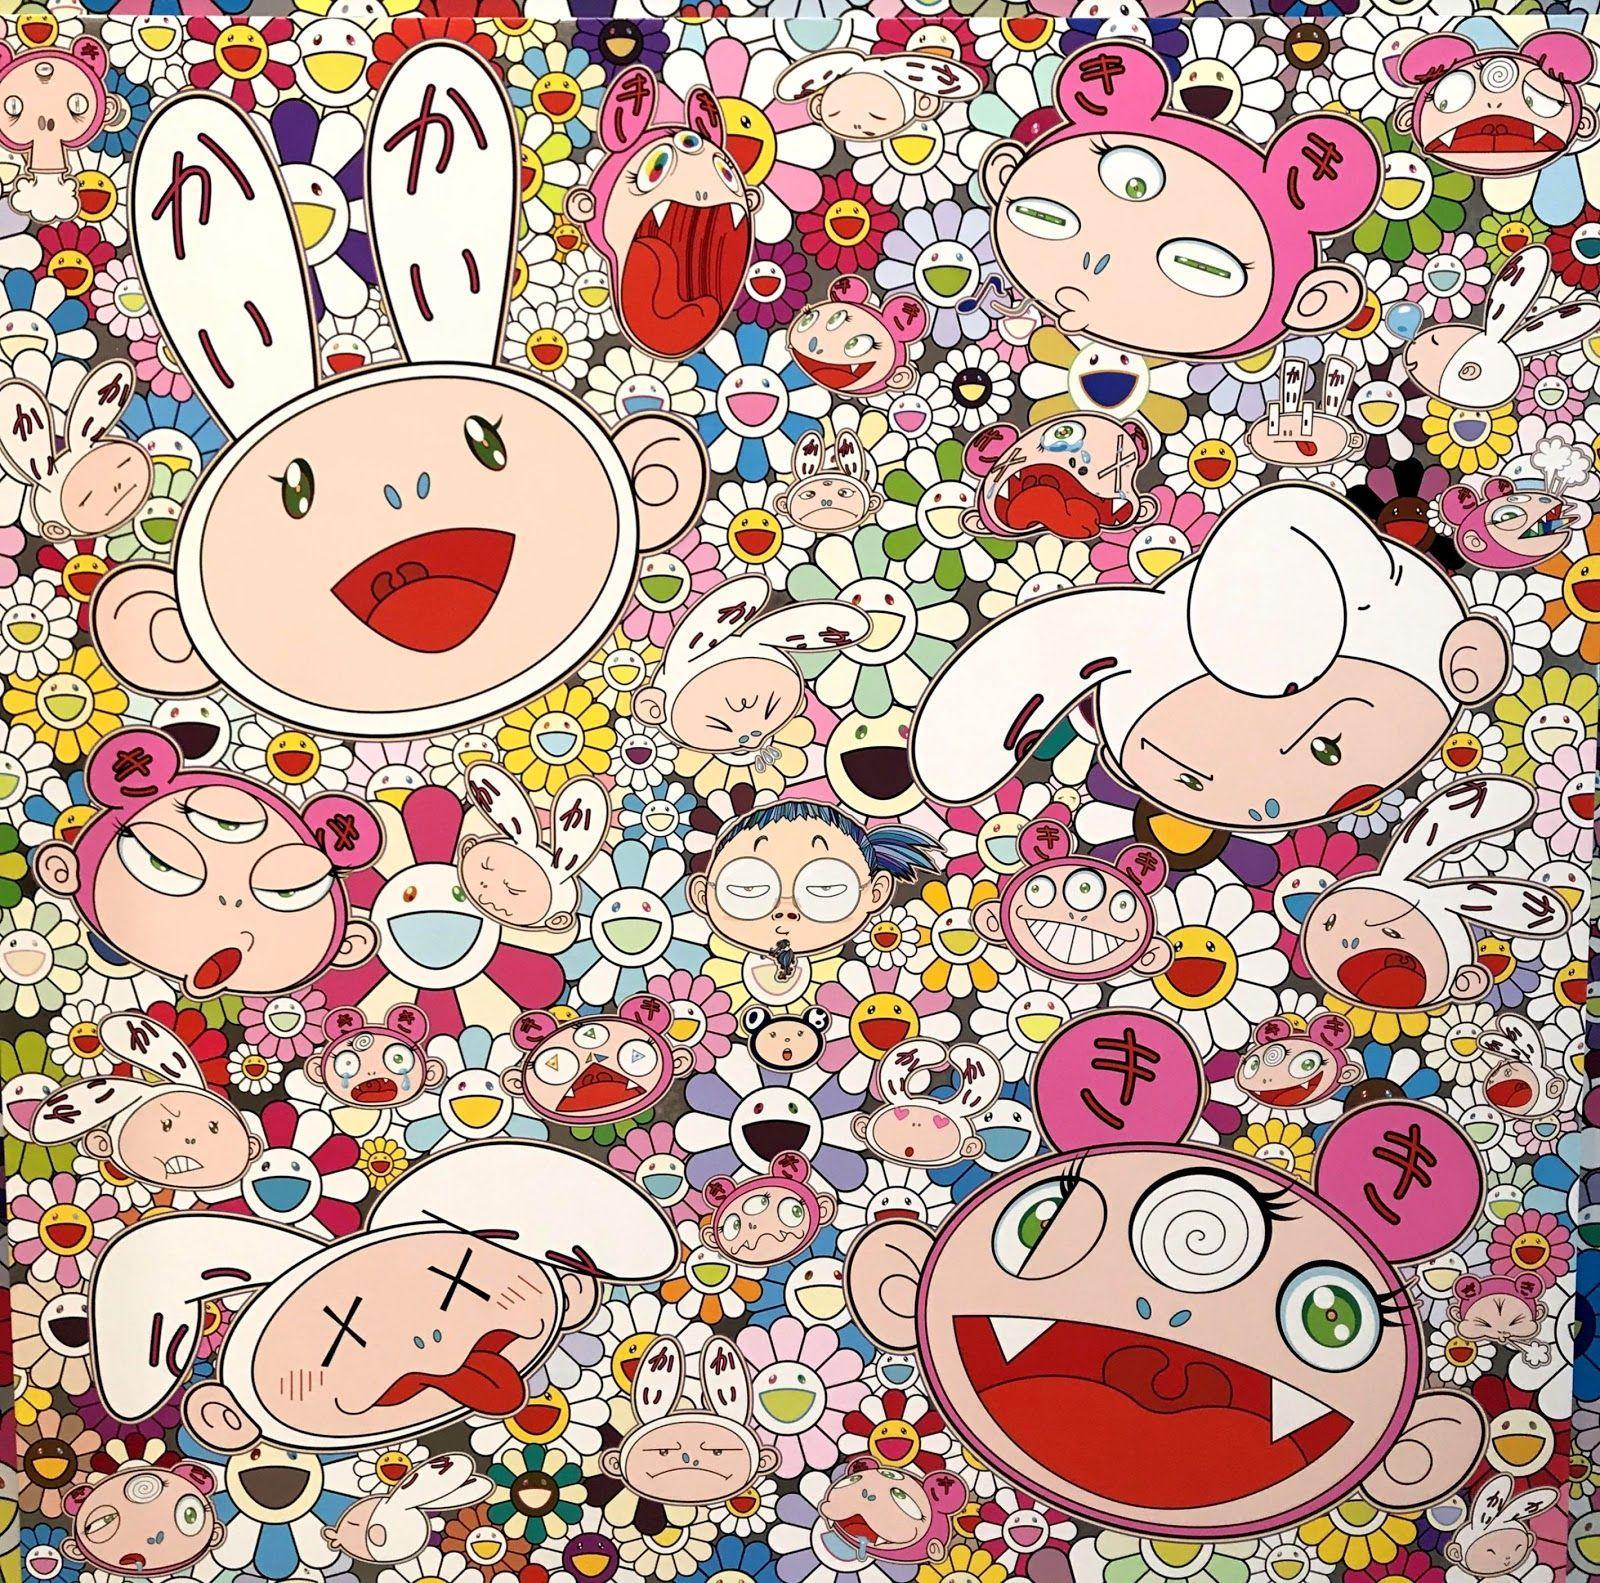 Takashi Murakami 4K Wallpapers - Top Free Takashi Murakami ...